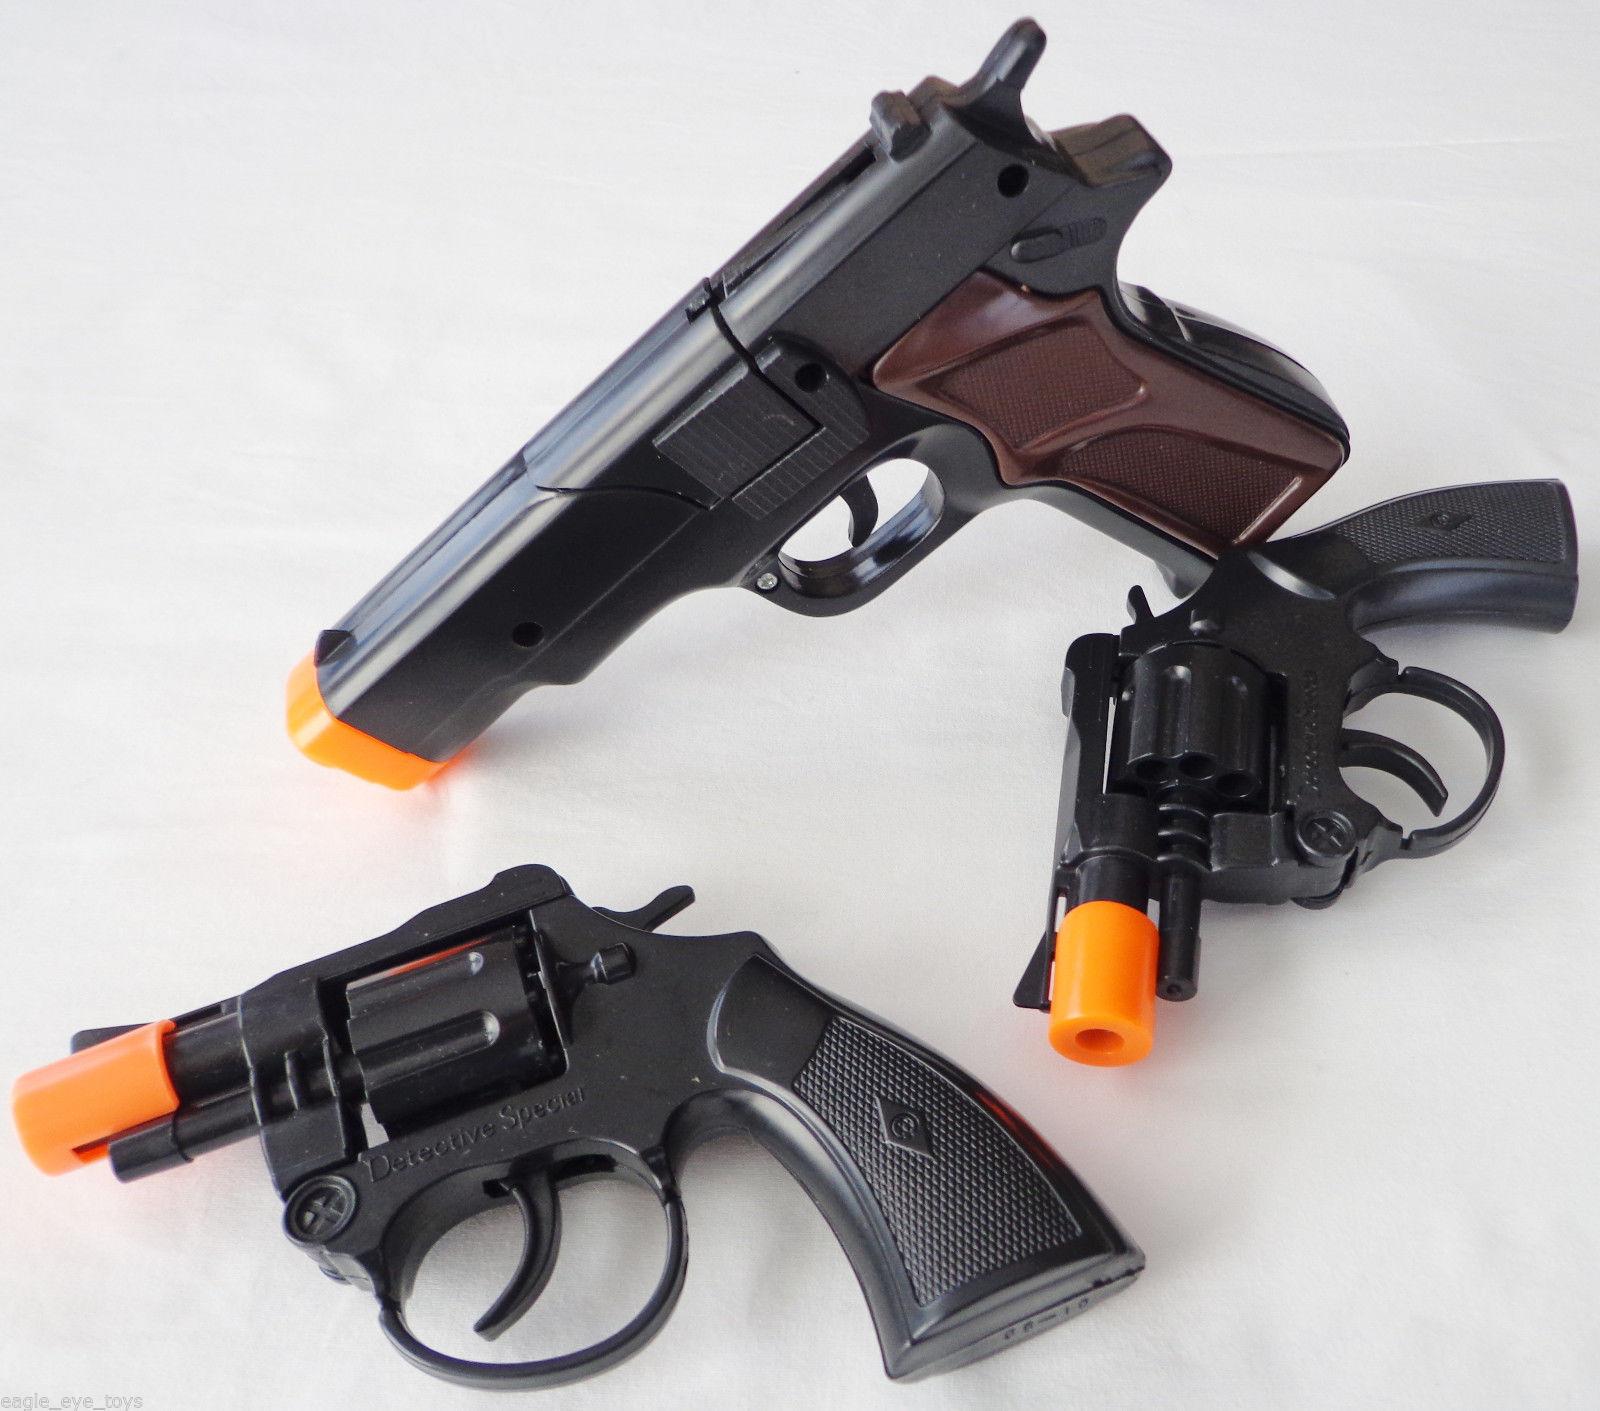 Toy Guns Military Detective Black 9MM Pistol Snub-nosed Revolver 3x Cap Gun Set